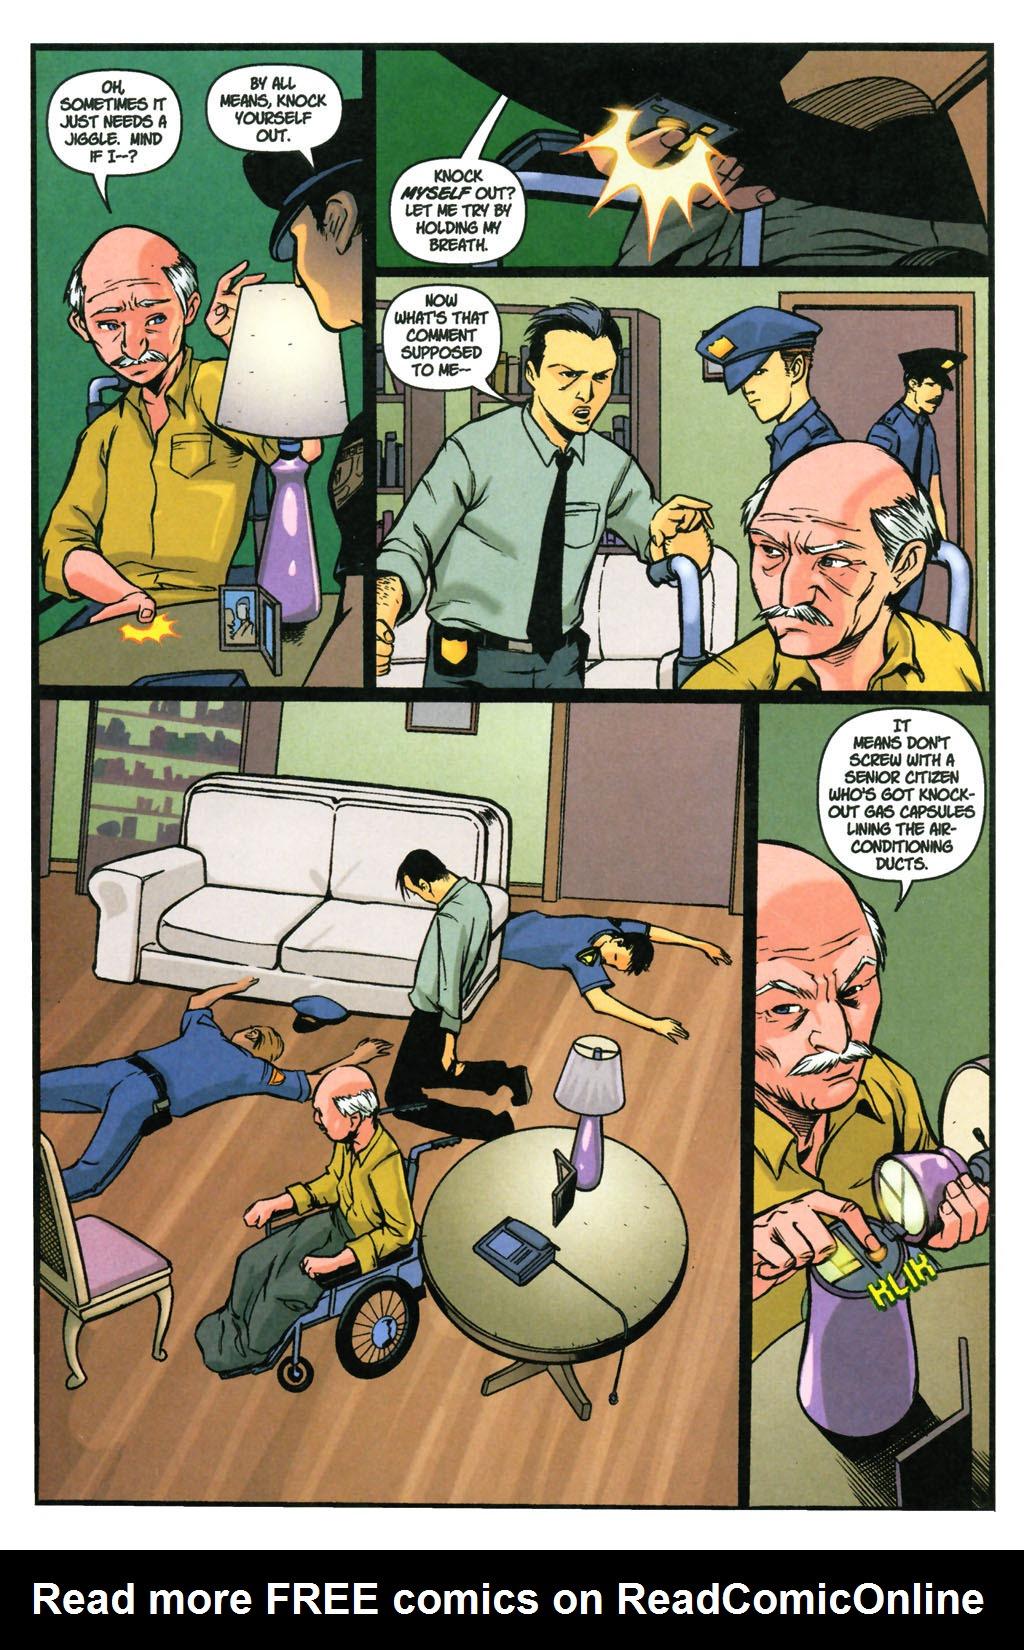 Read online SpyBoy: Final Exam comic -  Issue #3 - 13